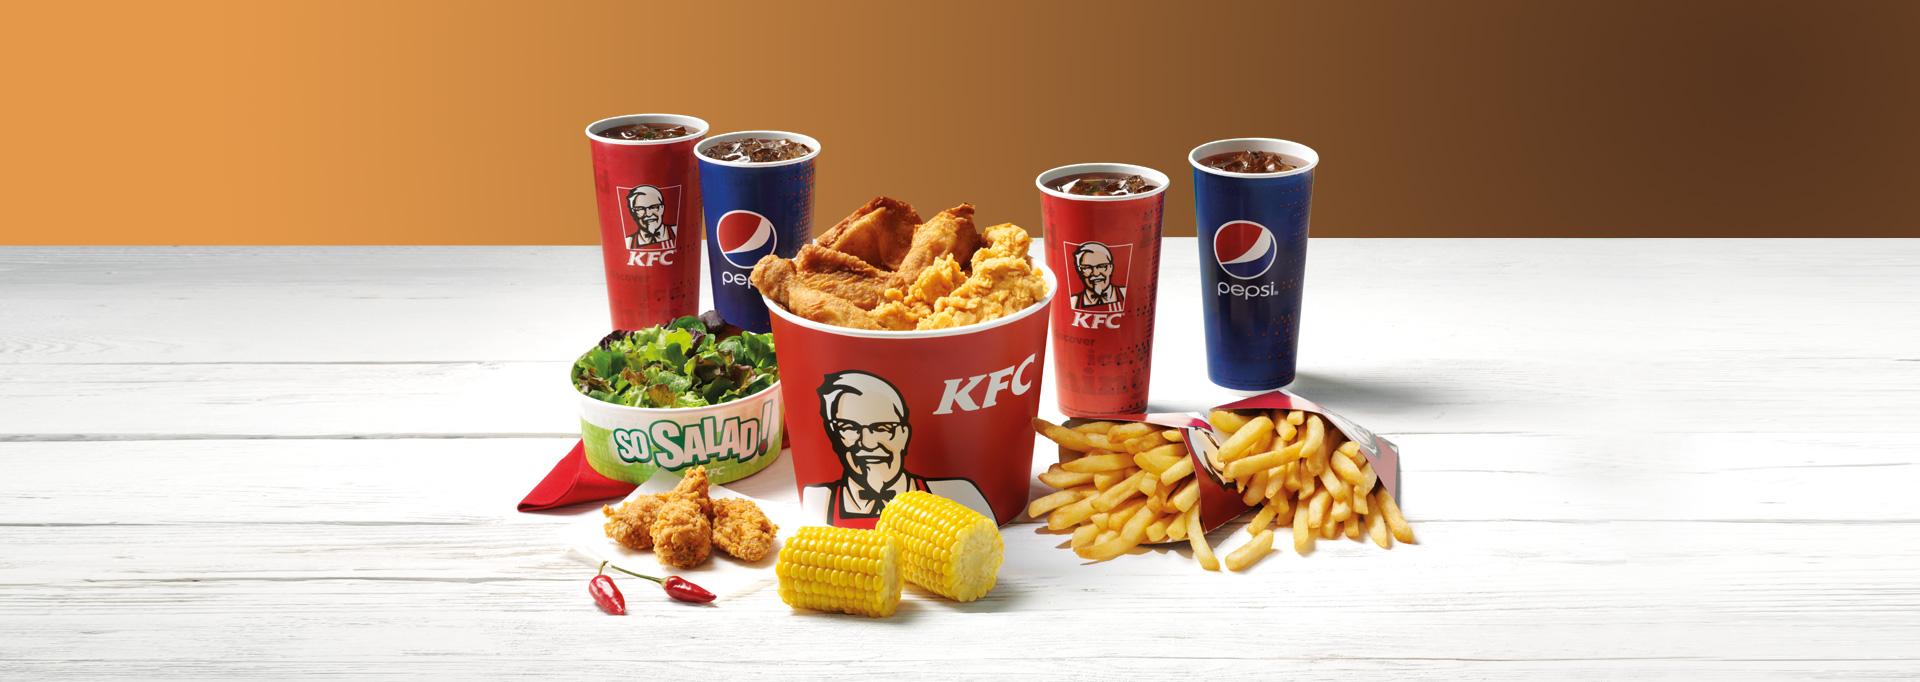 kfc pollo fritto menu